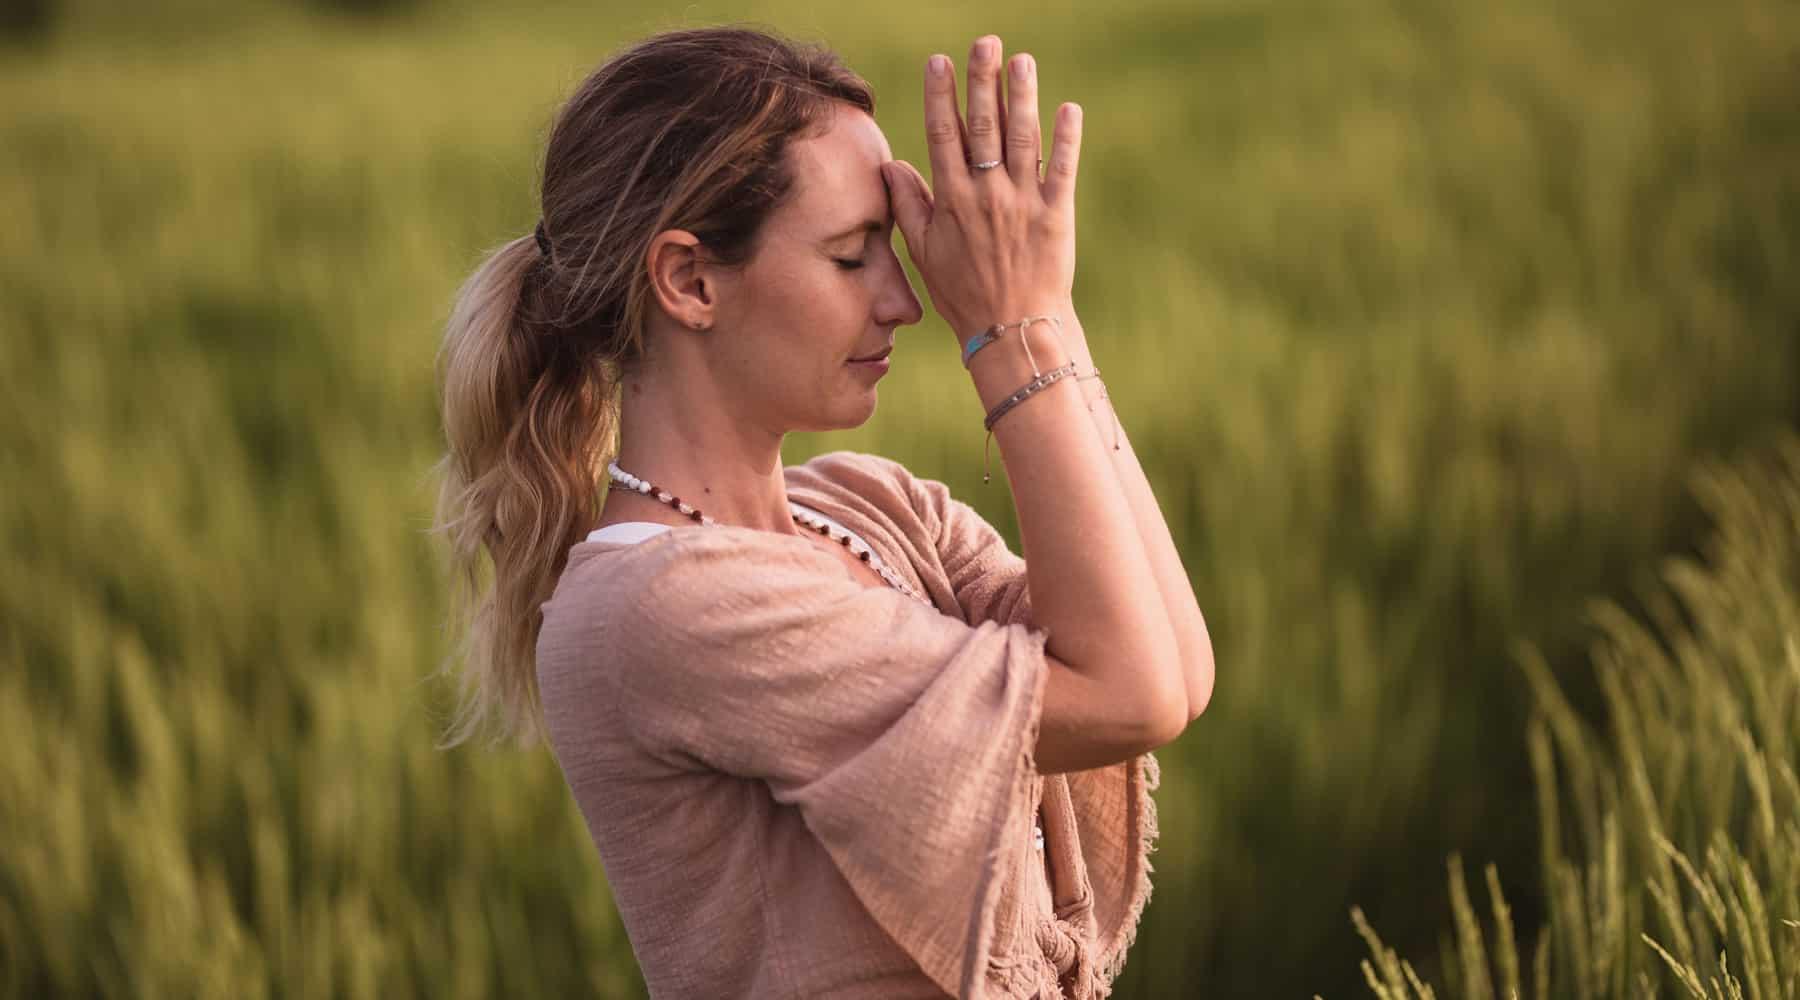 Yoga & Juliet, Julia Hofgartner, Yoga, Bali, Reisfelder